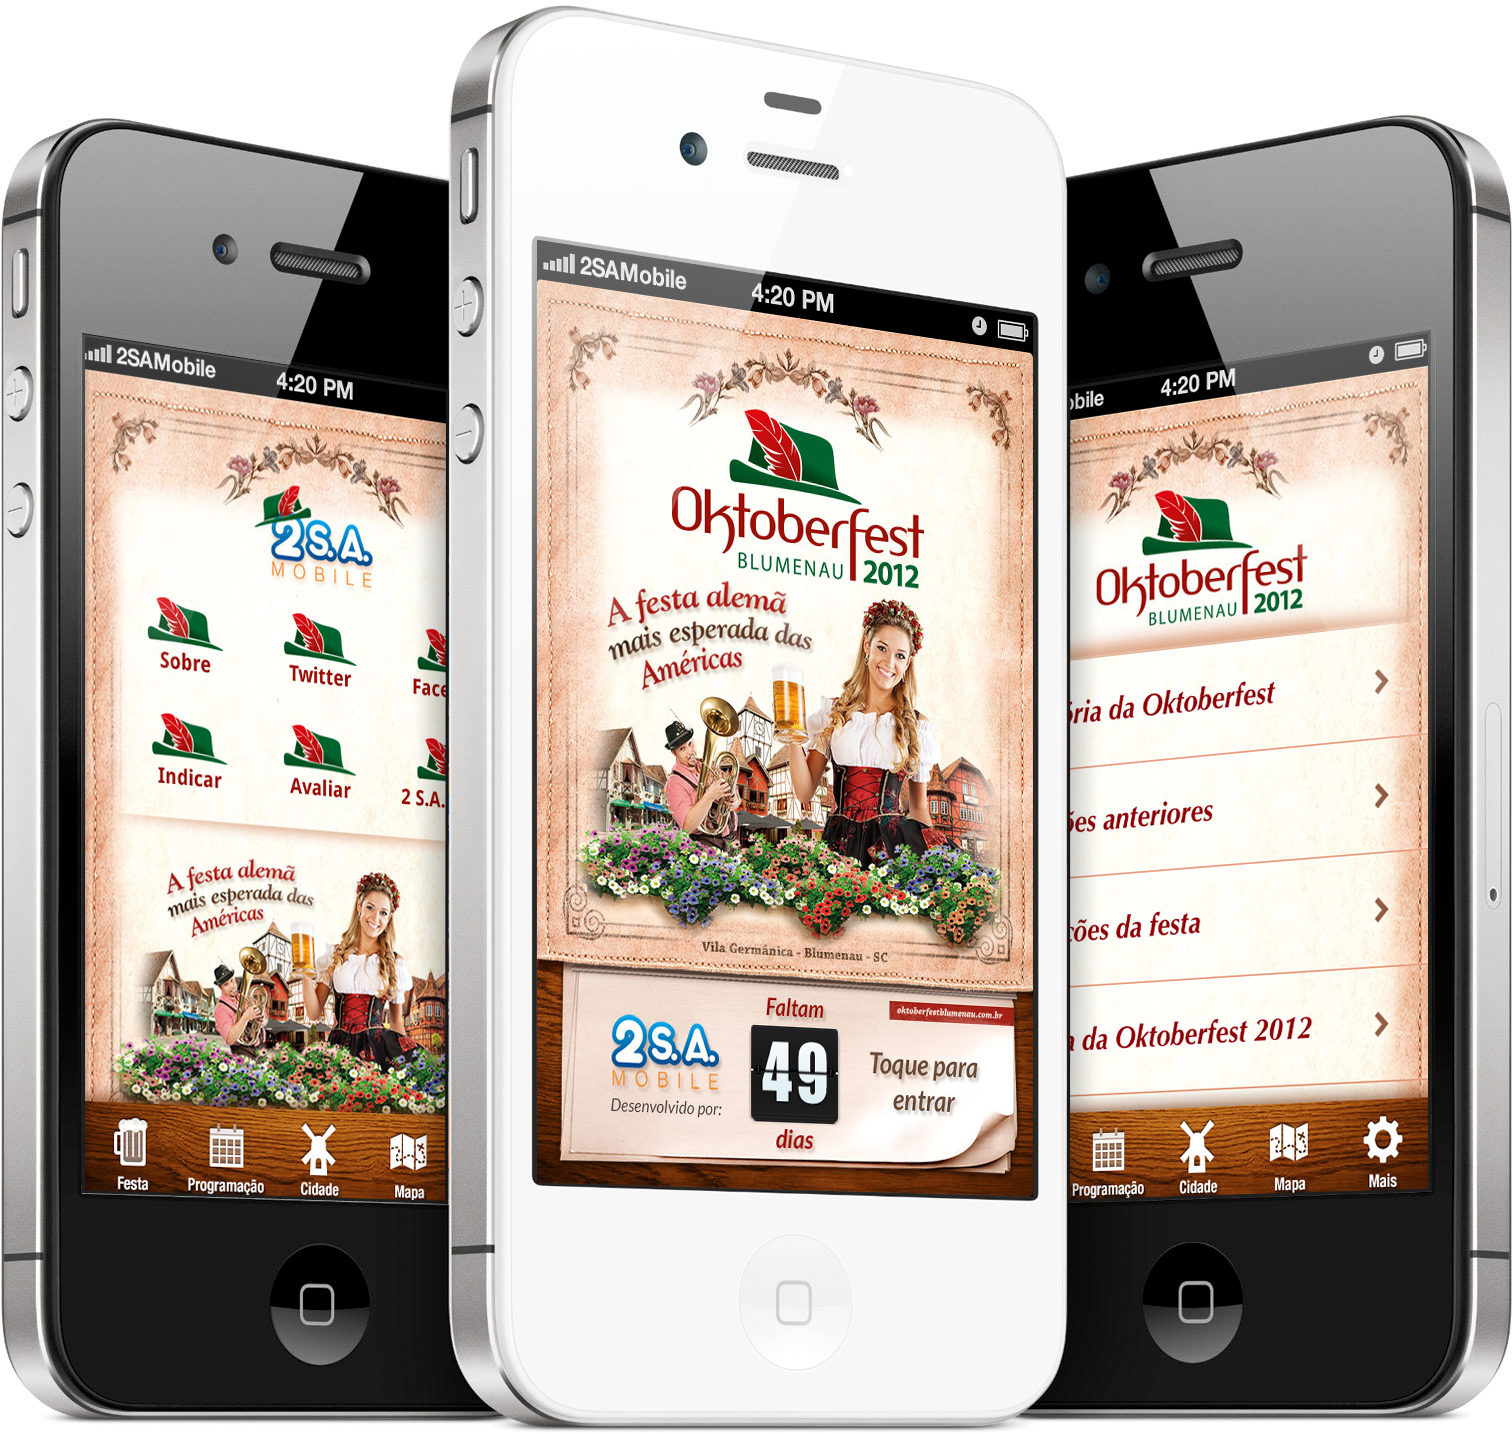 Oktoberfest Blumenau 2012 - iPhones